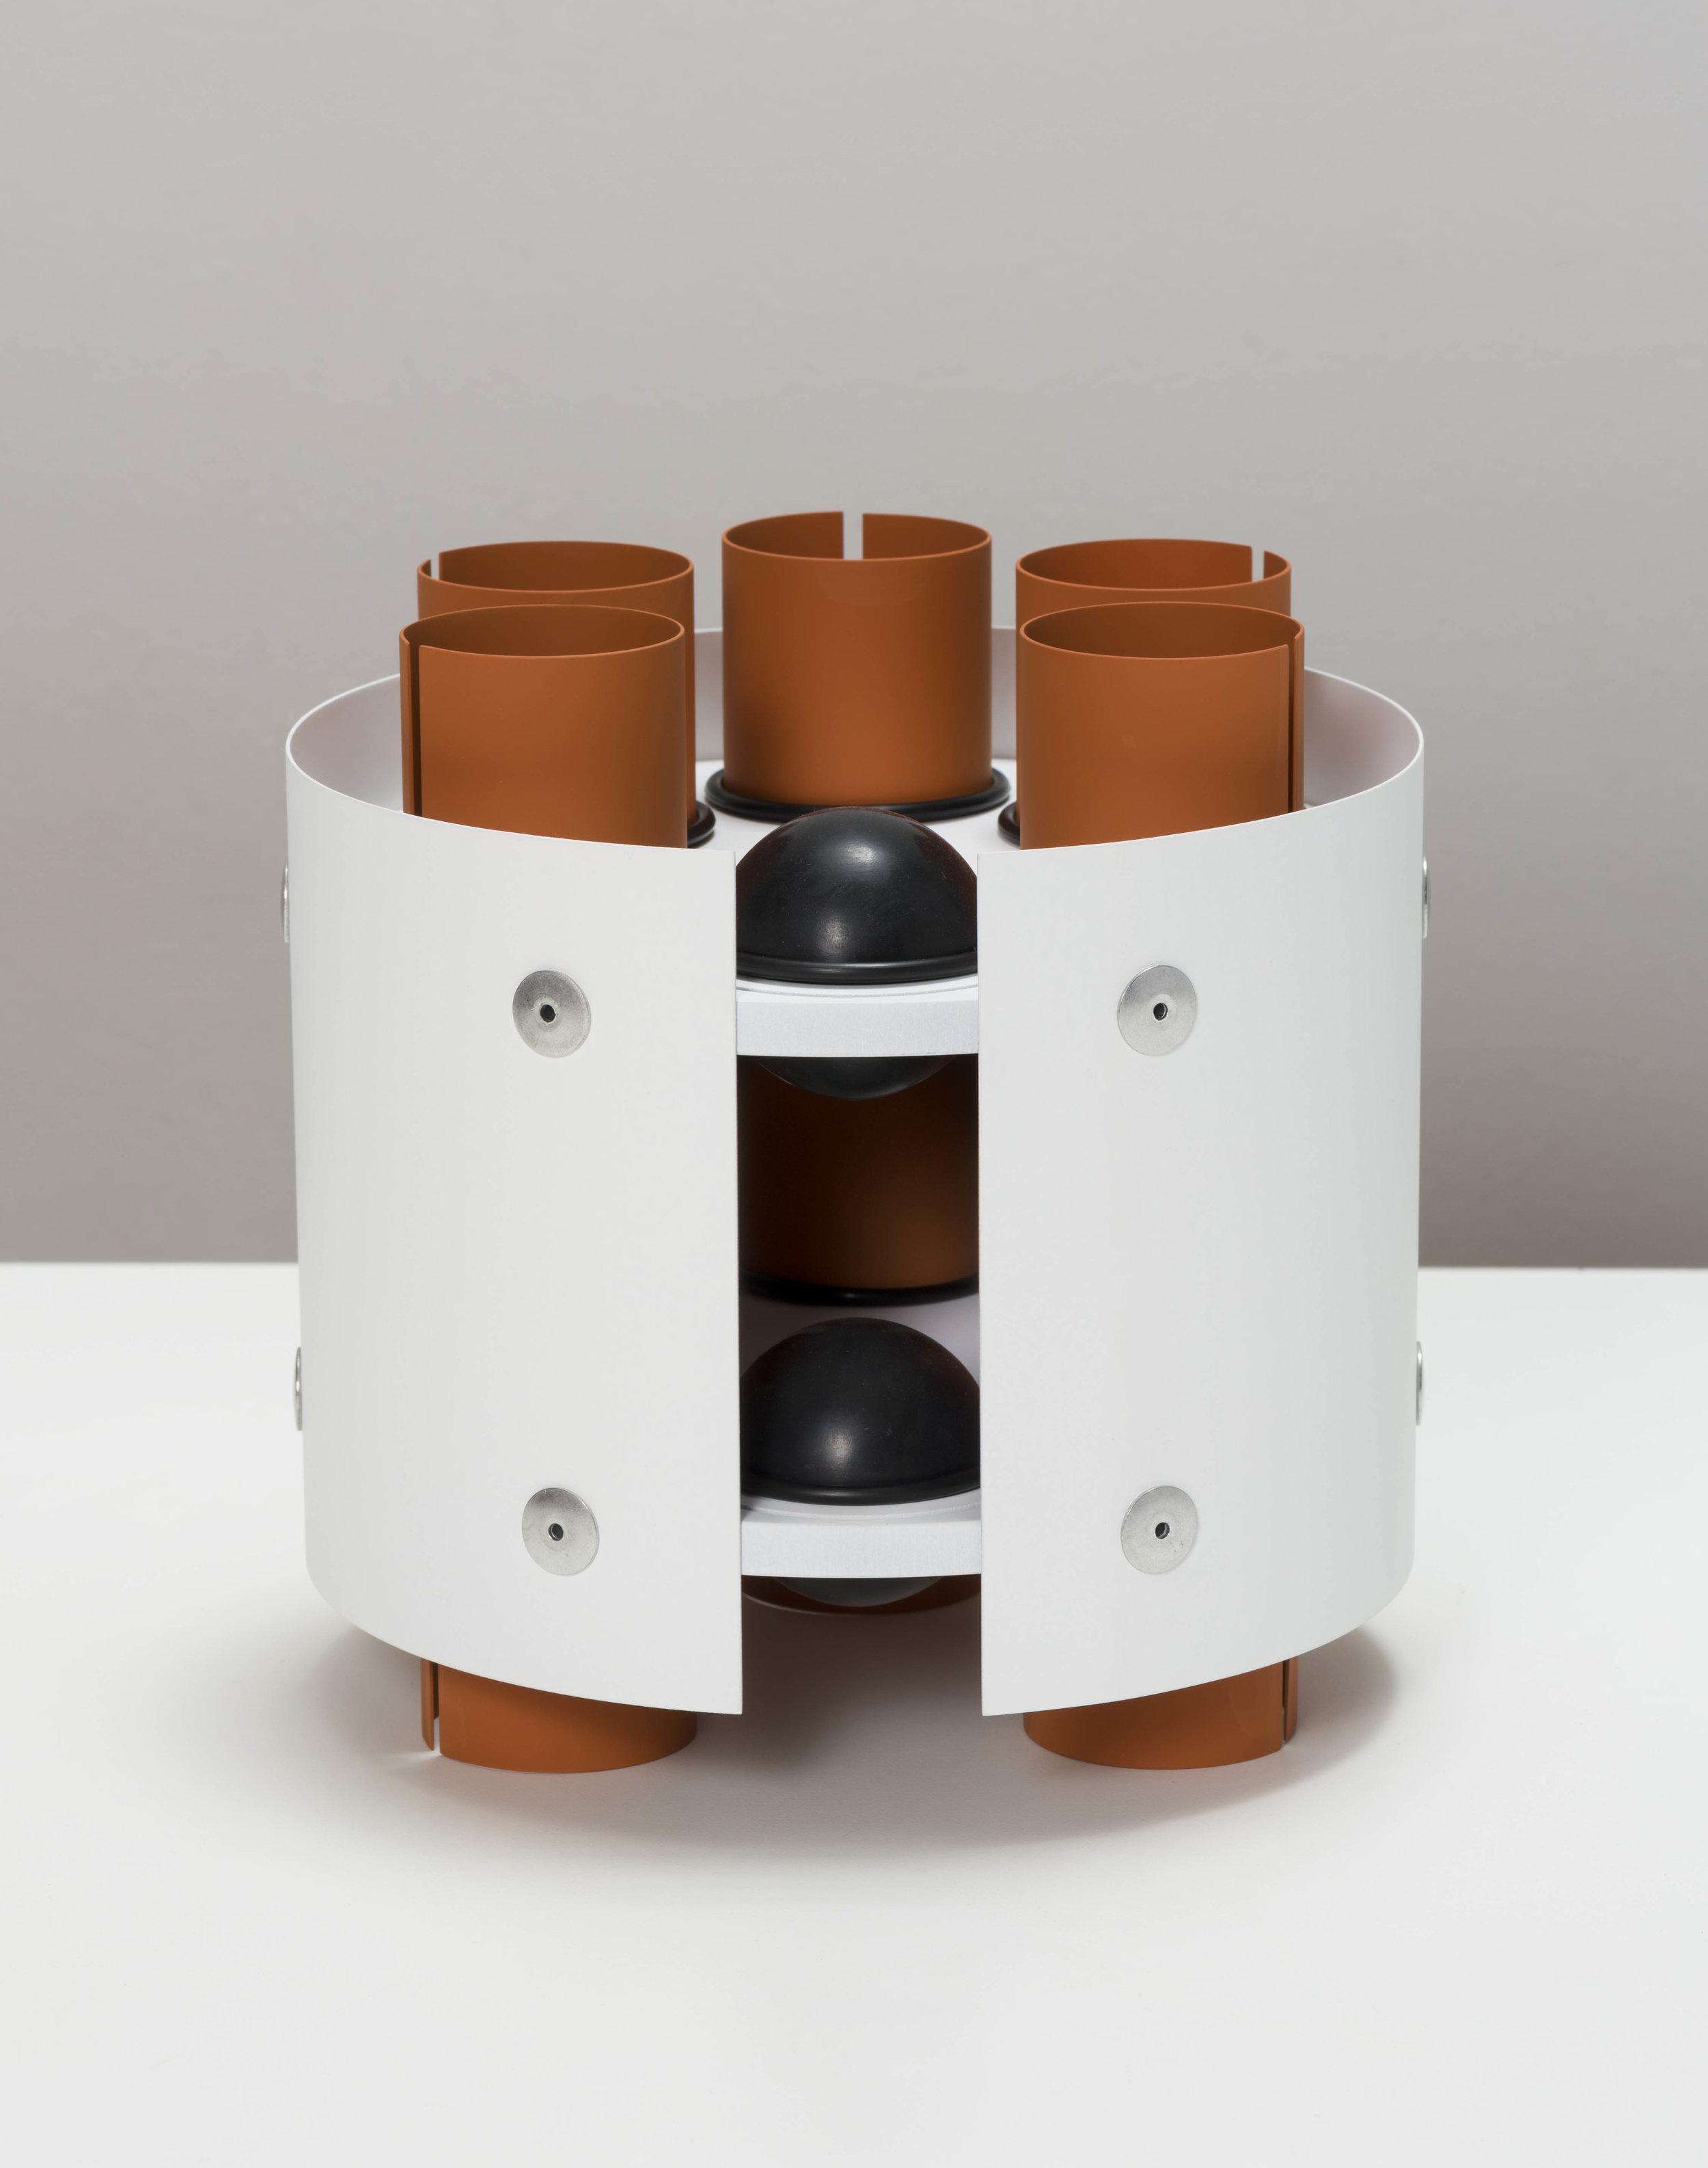 Matt Paweski,  Rotary - 5/6 , 2019, aluminum, aluminum rivets, rubber o-rings, rubber plugs, vinyl paint, 7 × 8 × 8 inches (17.8 × 20.3 × 20.3 cm)